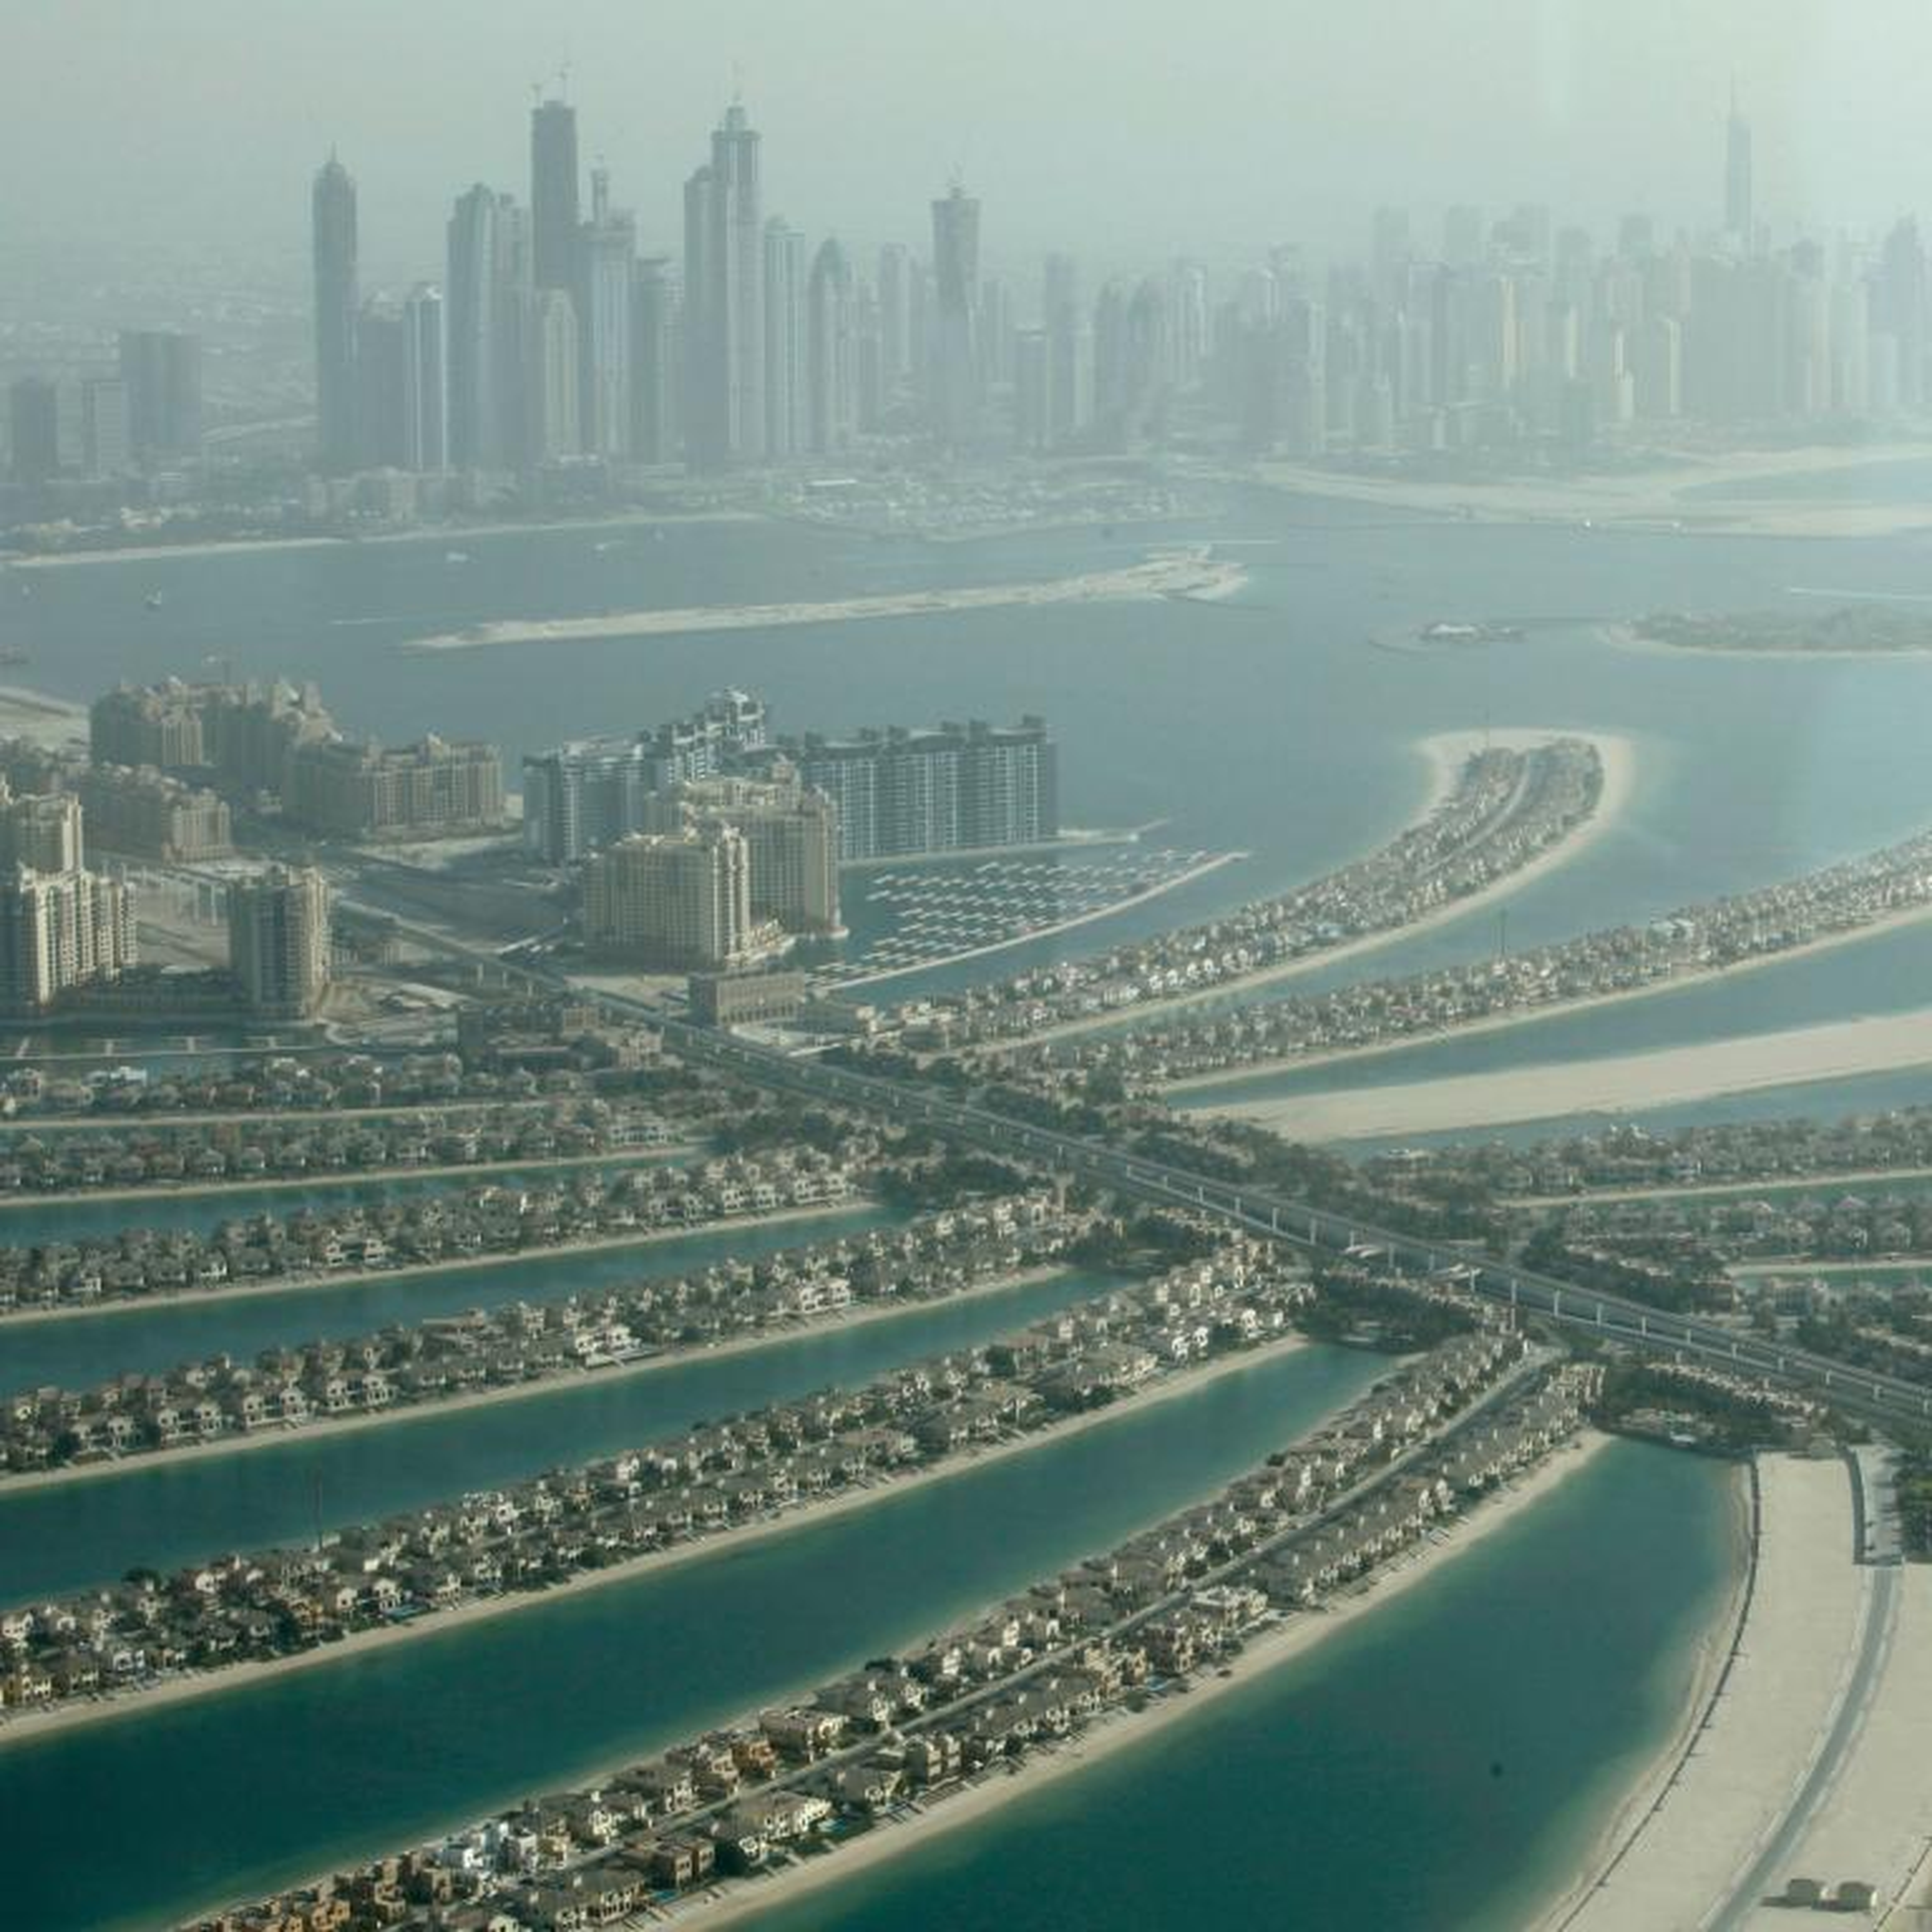 An aerial photo of the Palm Islands in Dubai, UAE.